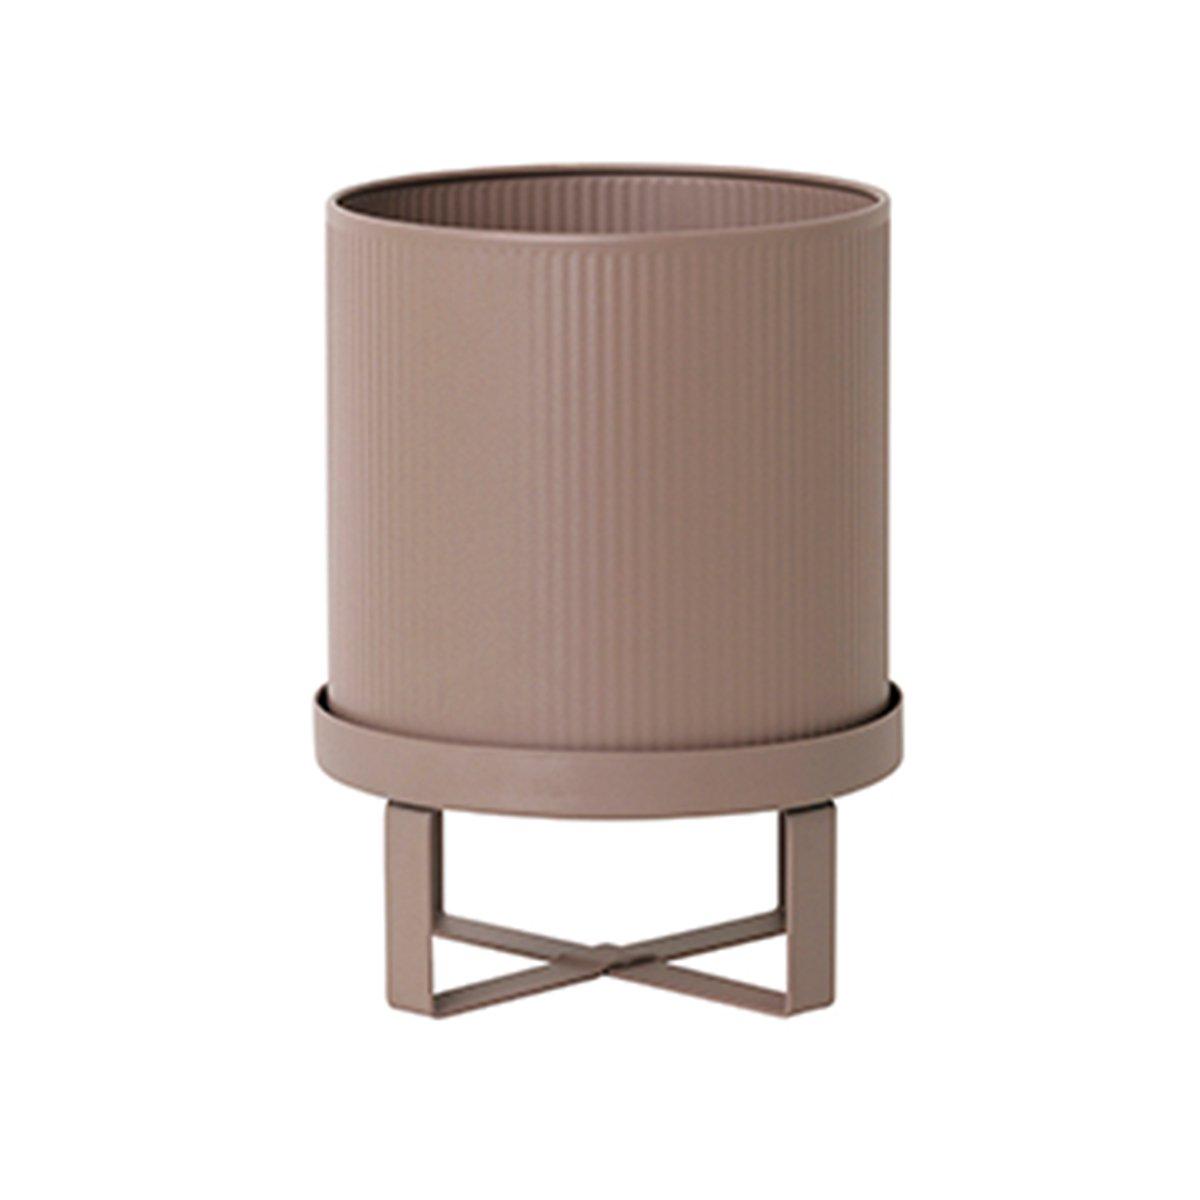 Ferm Living Bau Pot - Small/Dusty Roze